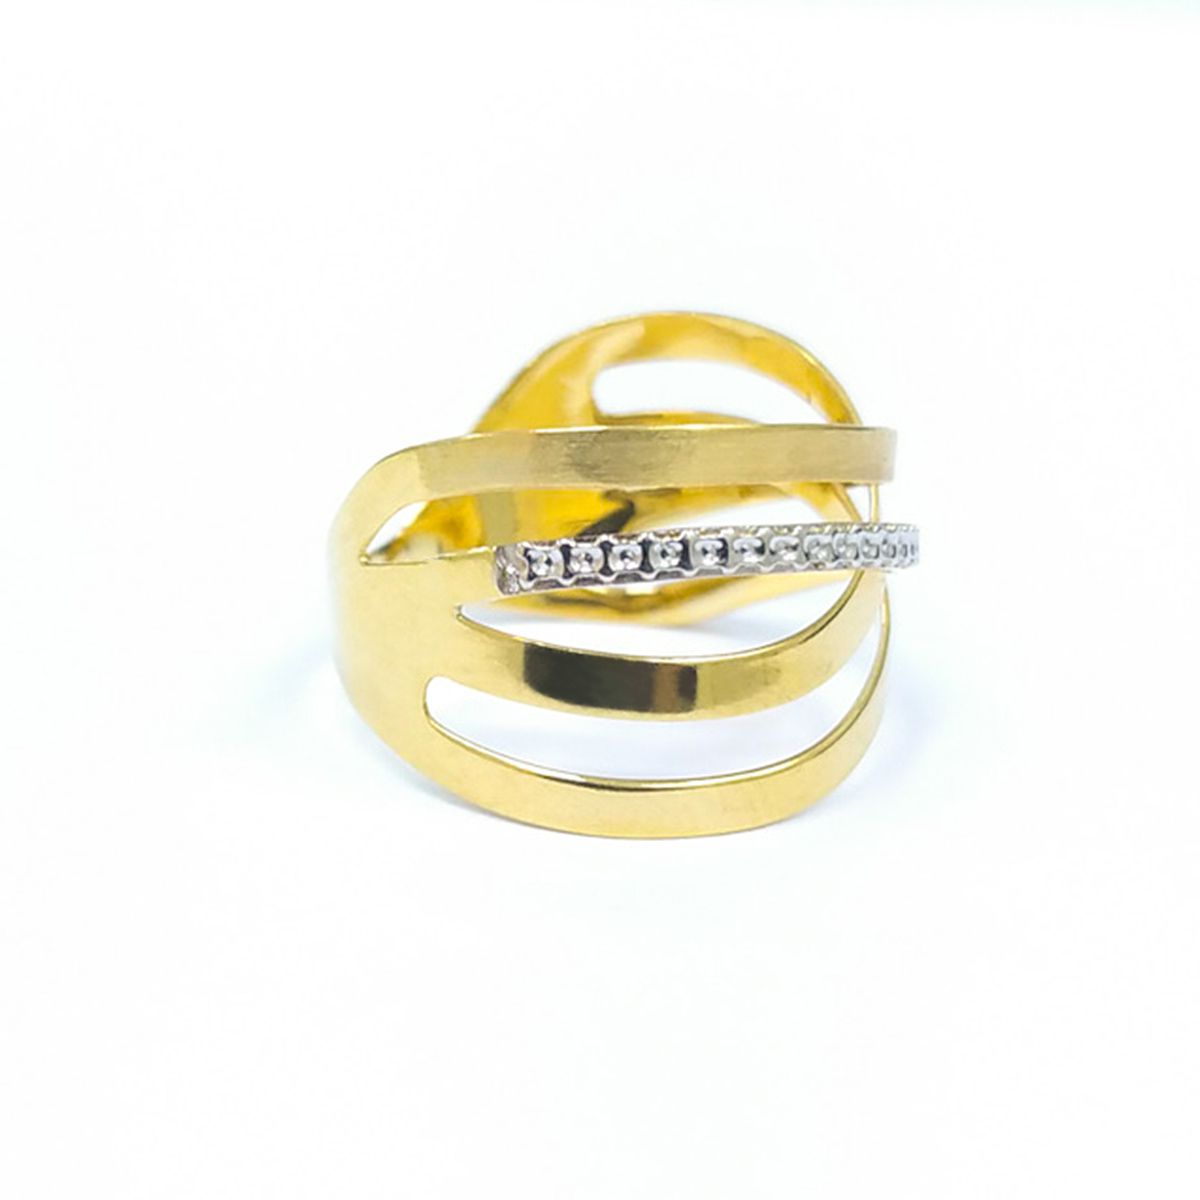 Anel em Ouro 18K - Amarelo & Branco Traco